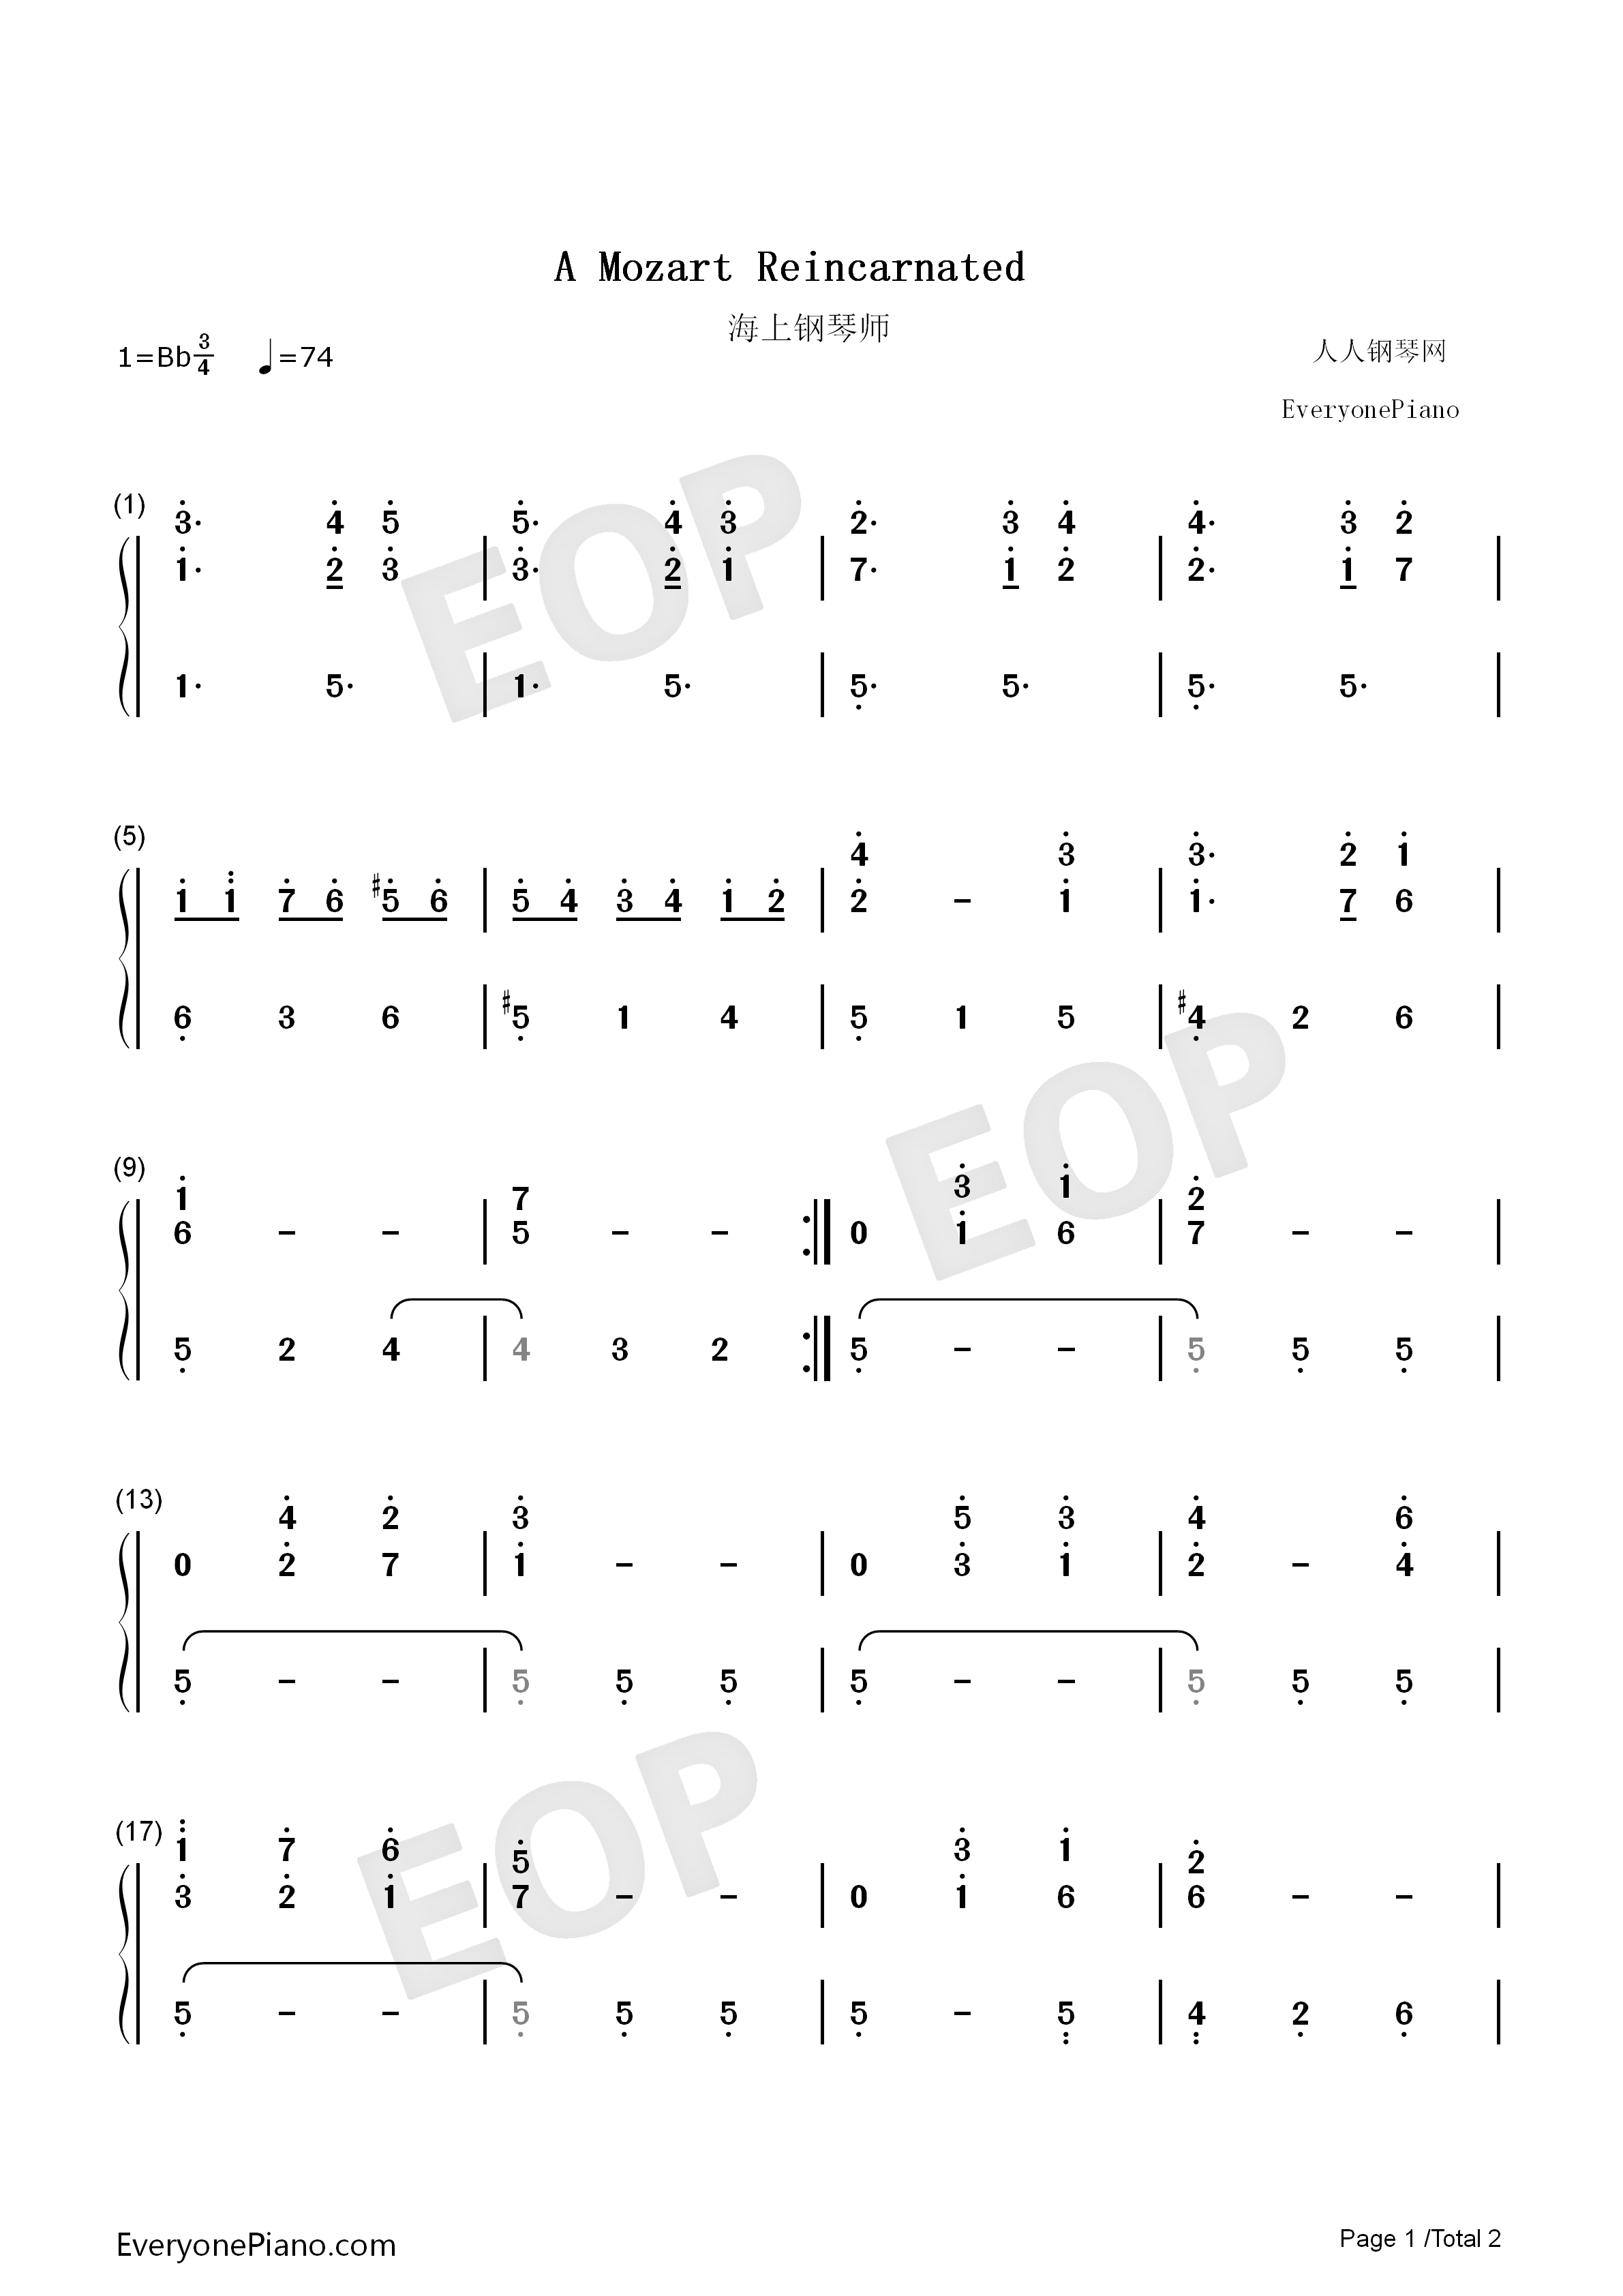 a mozart reincarnated-《海上钢琴师》插曲-eop教学曲双手简谱预览1